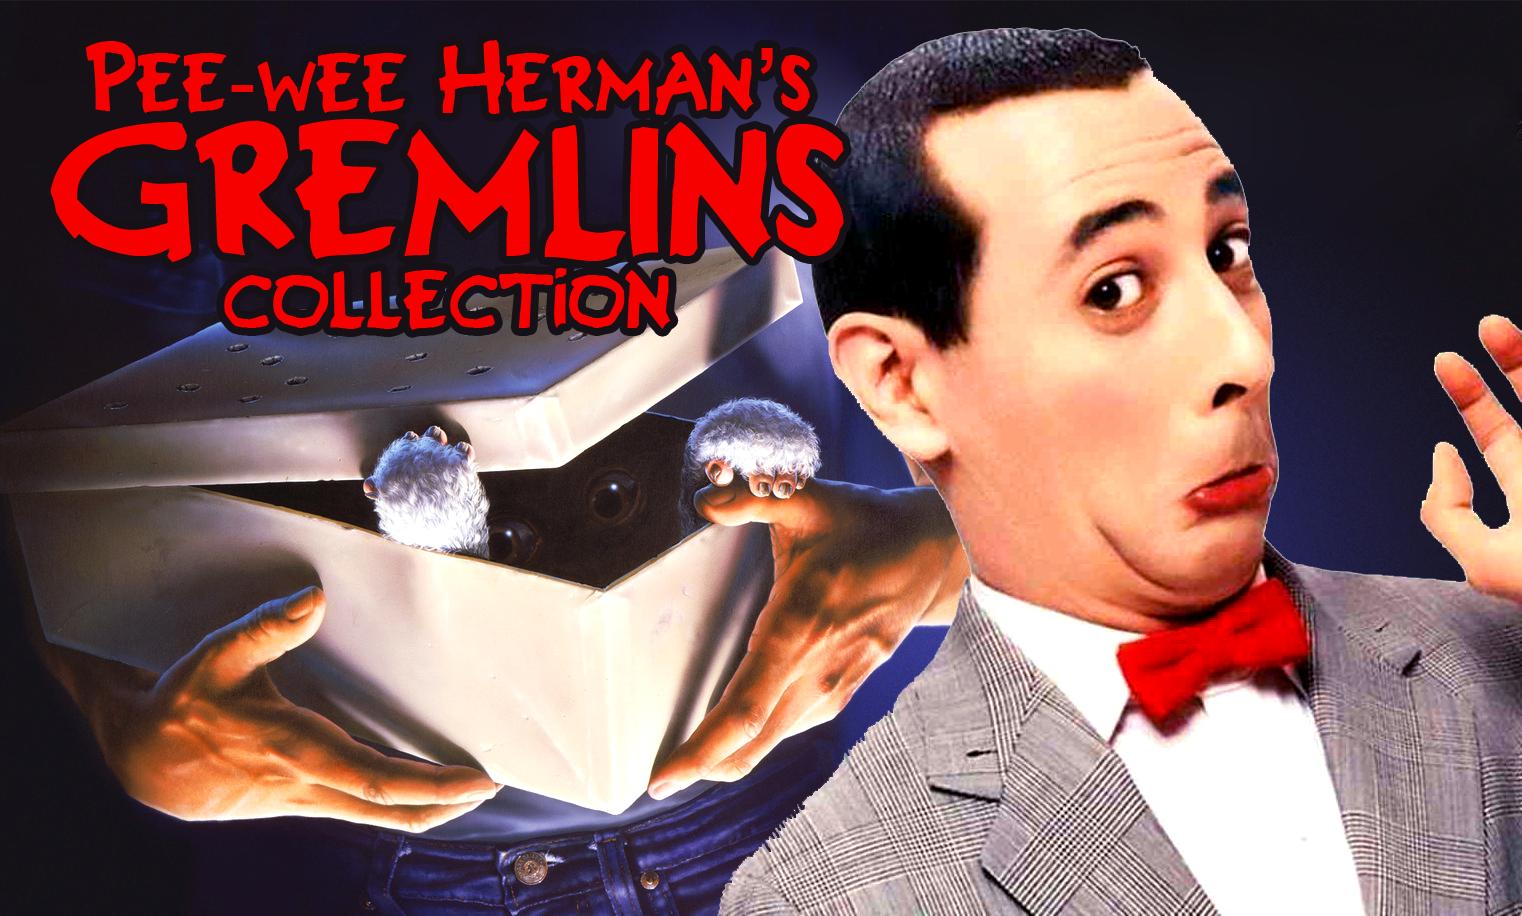 TOKYO TOY BASTARD: PEE-WEE HERMAN'S GREMLINS COLLECTION